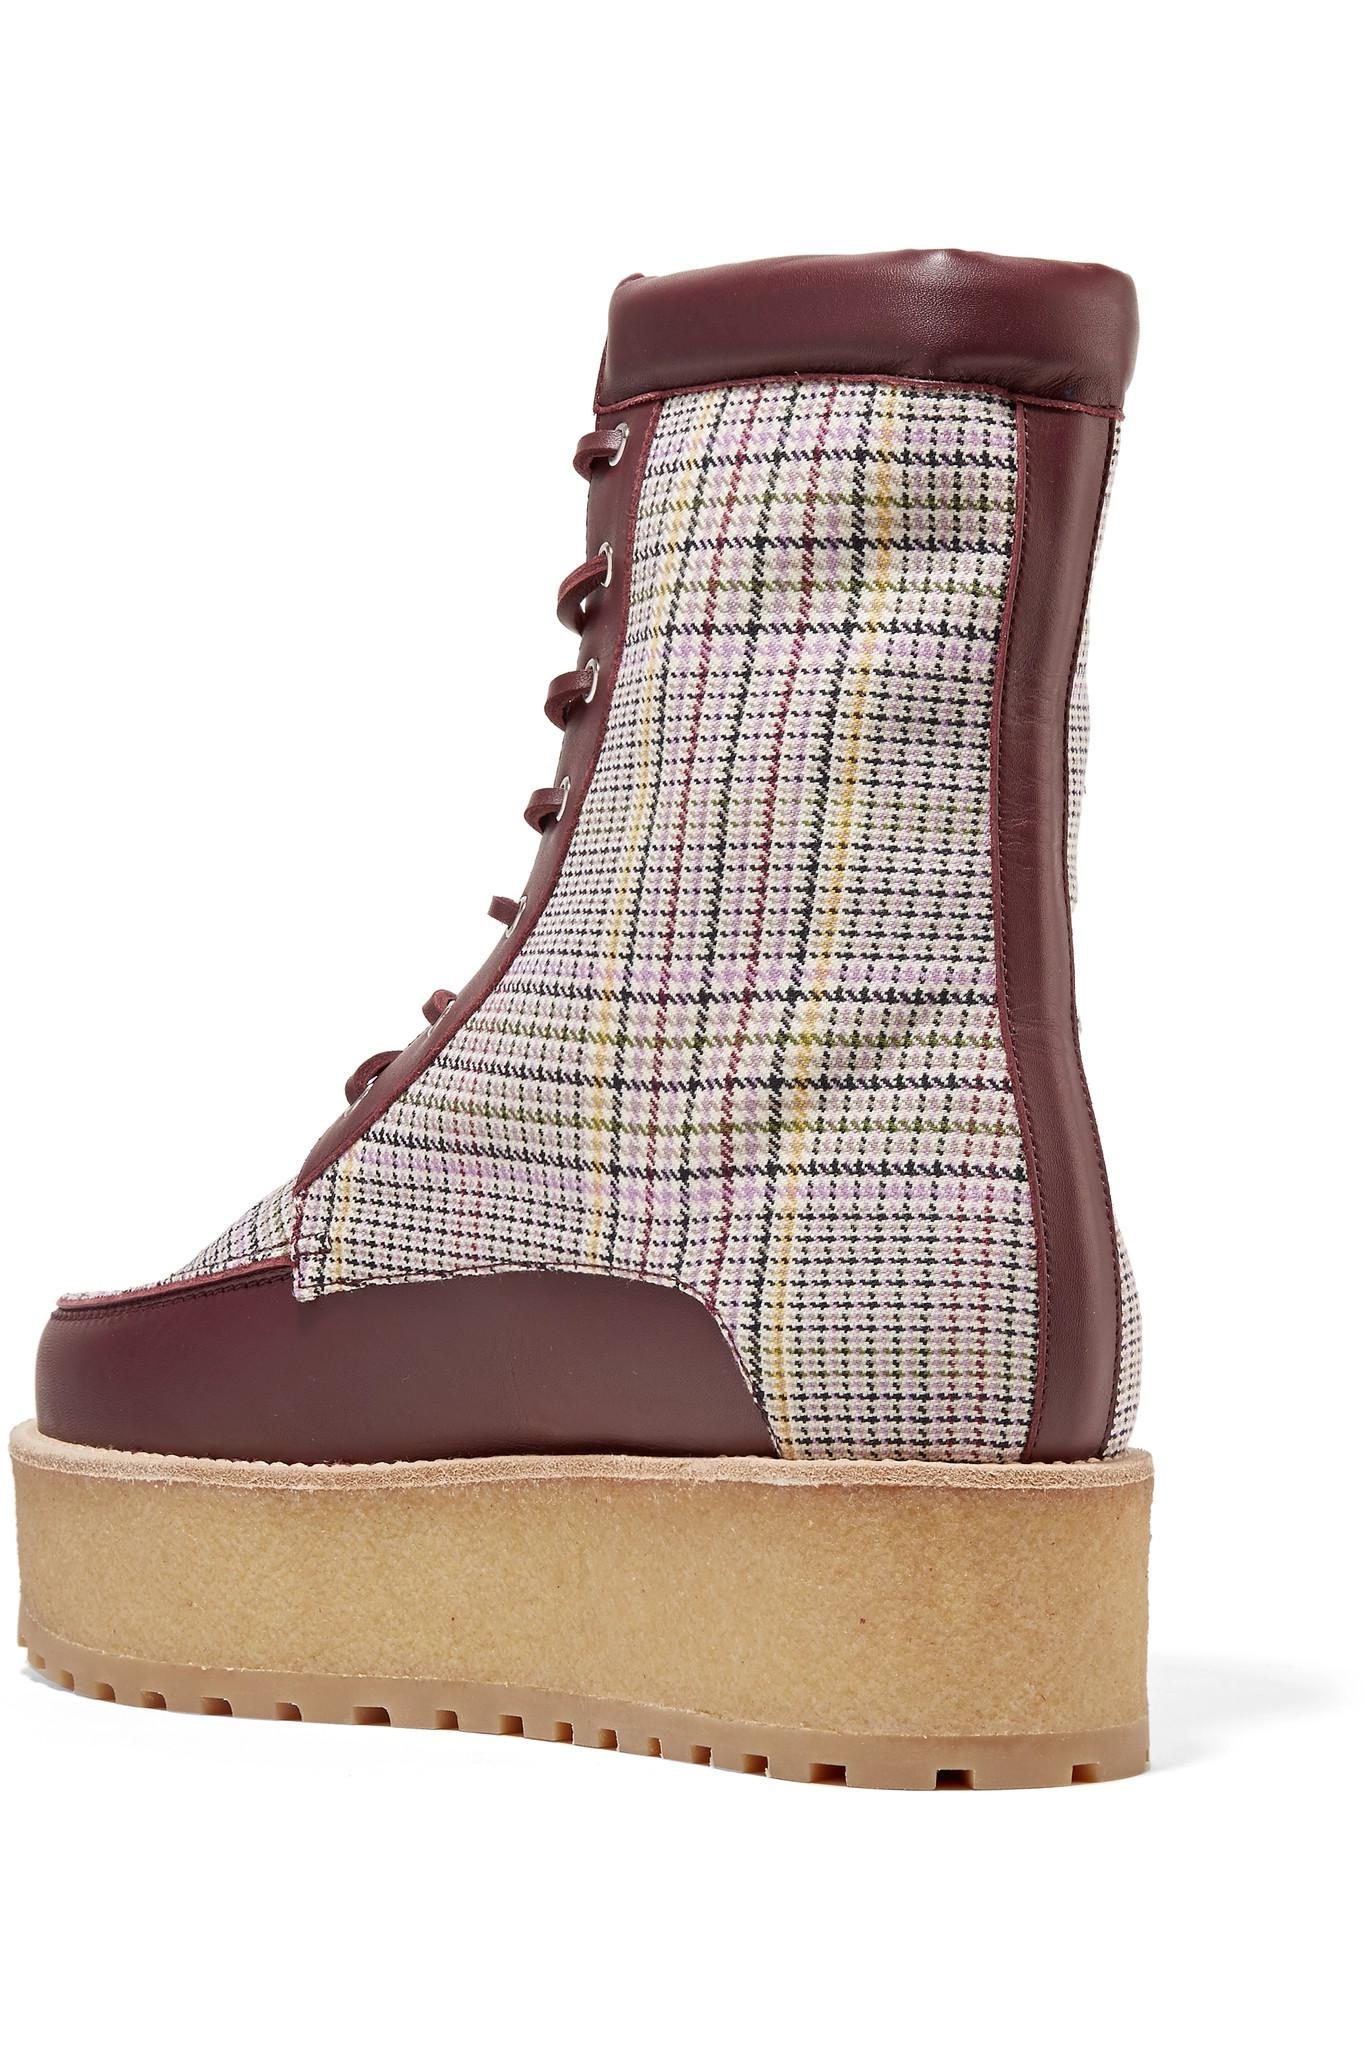 Gabriela Hearst Wool David Boots With Plaid Print